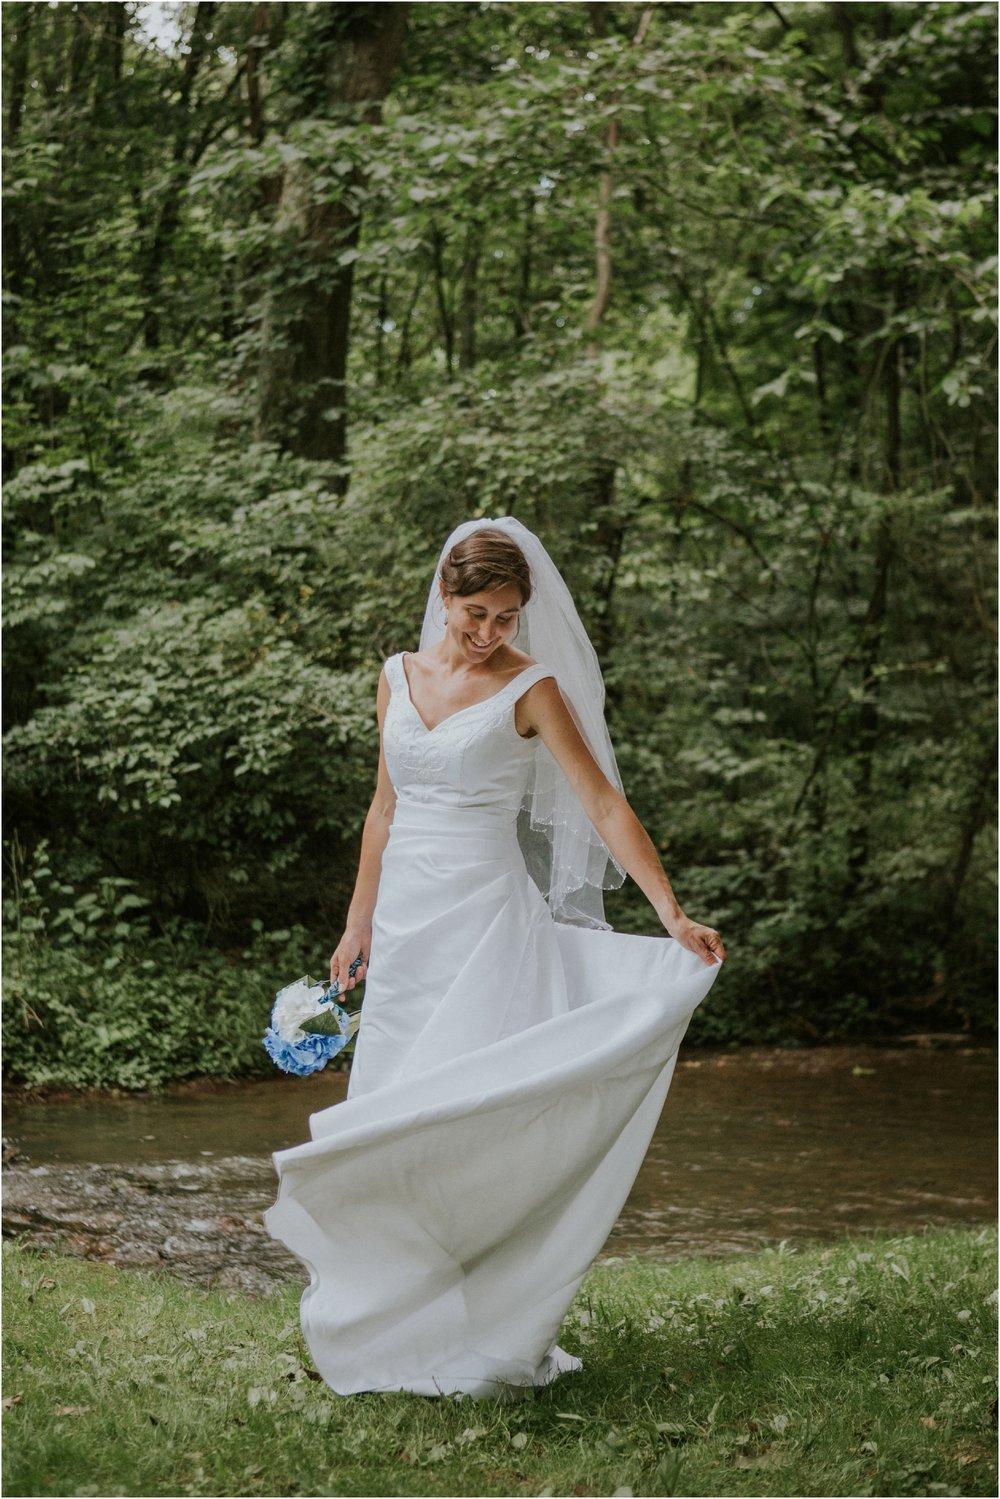 sugar-hollow-park-bristol-virginia-wedding-intimate-woodsy-black-forest-ceremony-adventurous-couple_0094.jpg